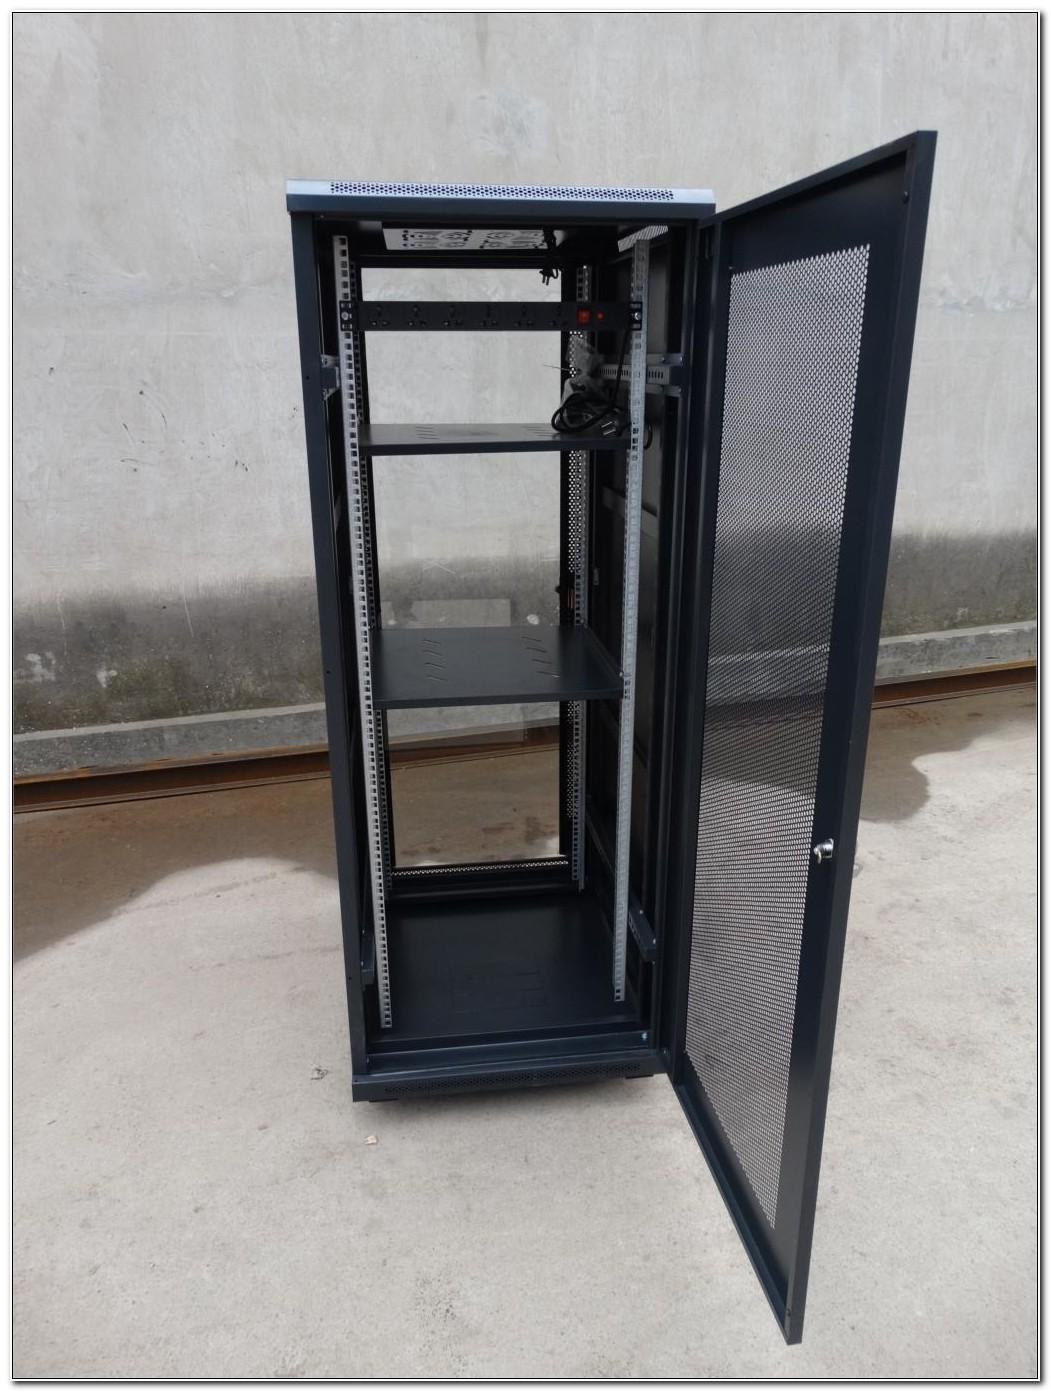 Cheap Server Rack Cabinet